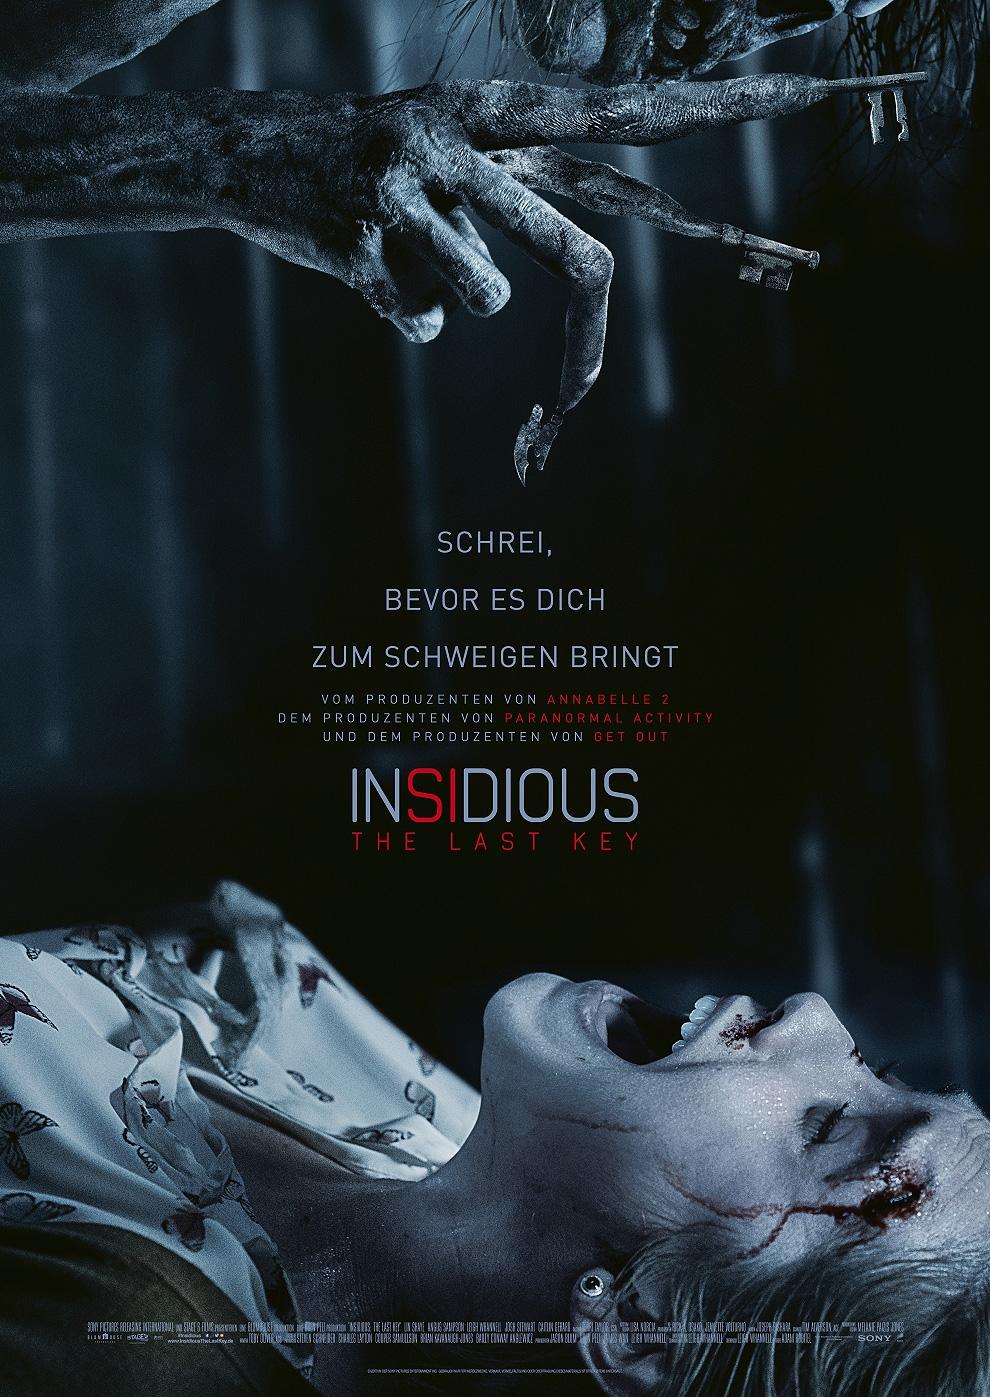 Insidious - The Last Key (Poster)